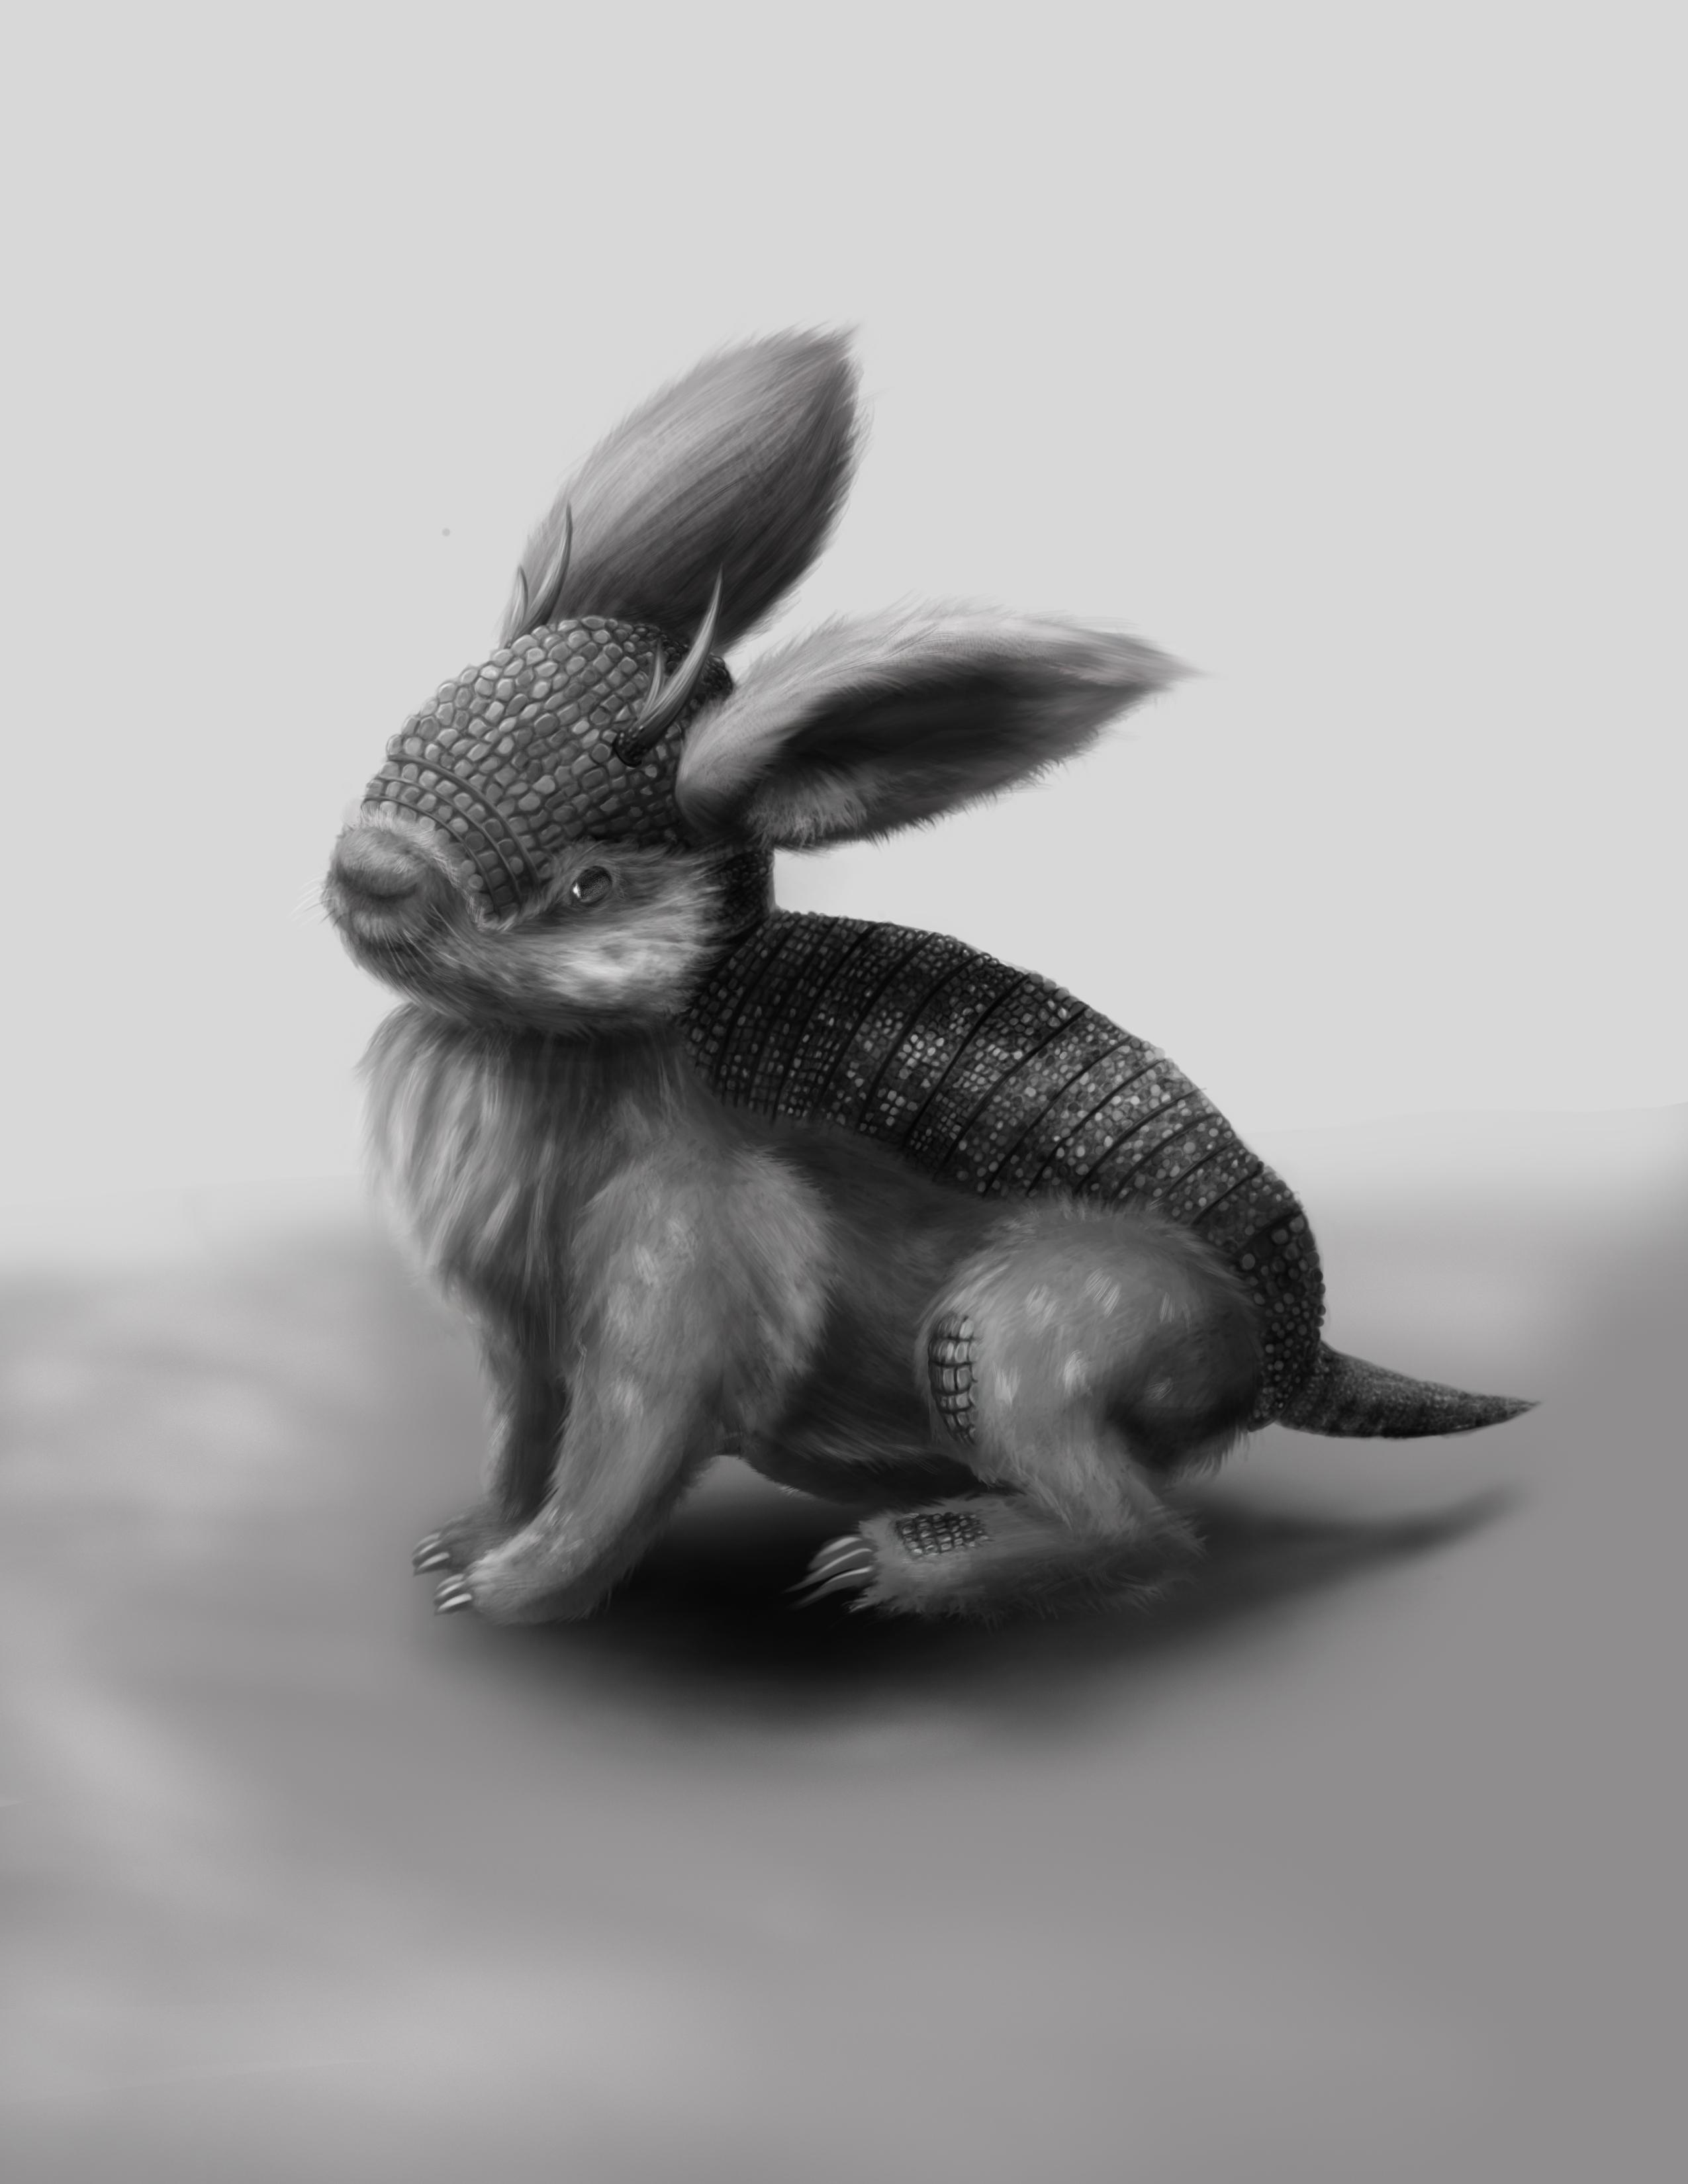 Yakizomo (Armored Hare)